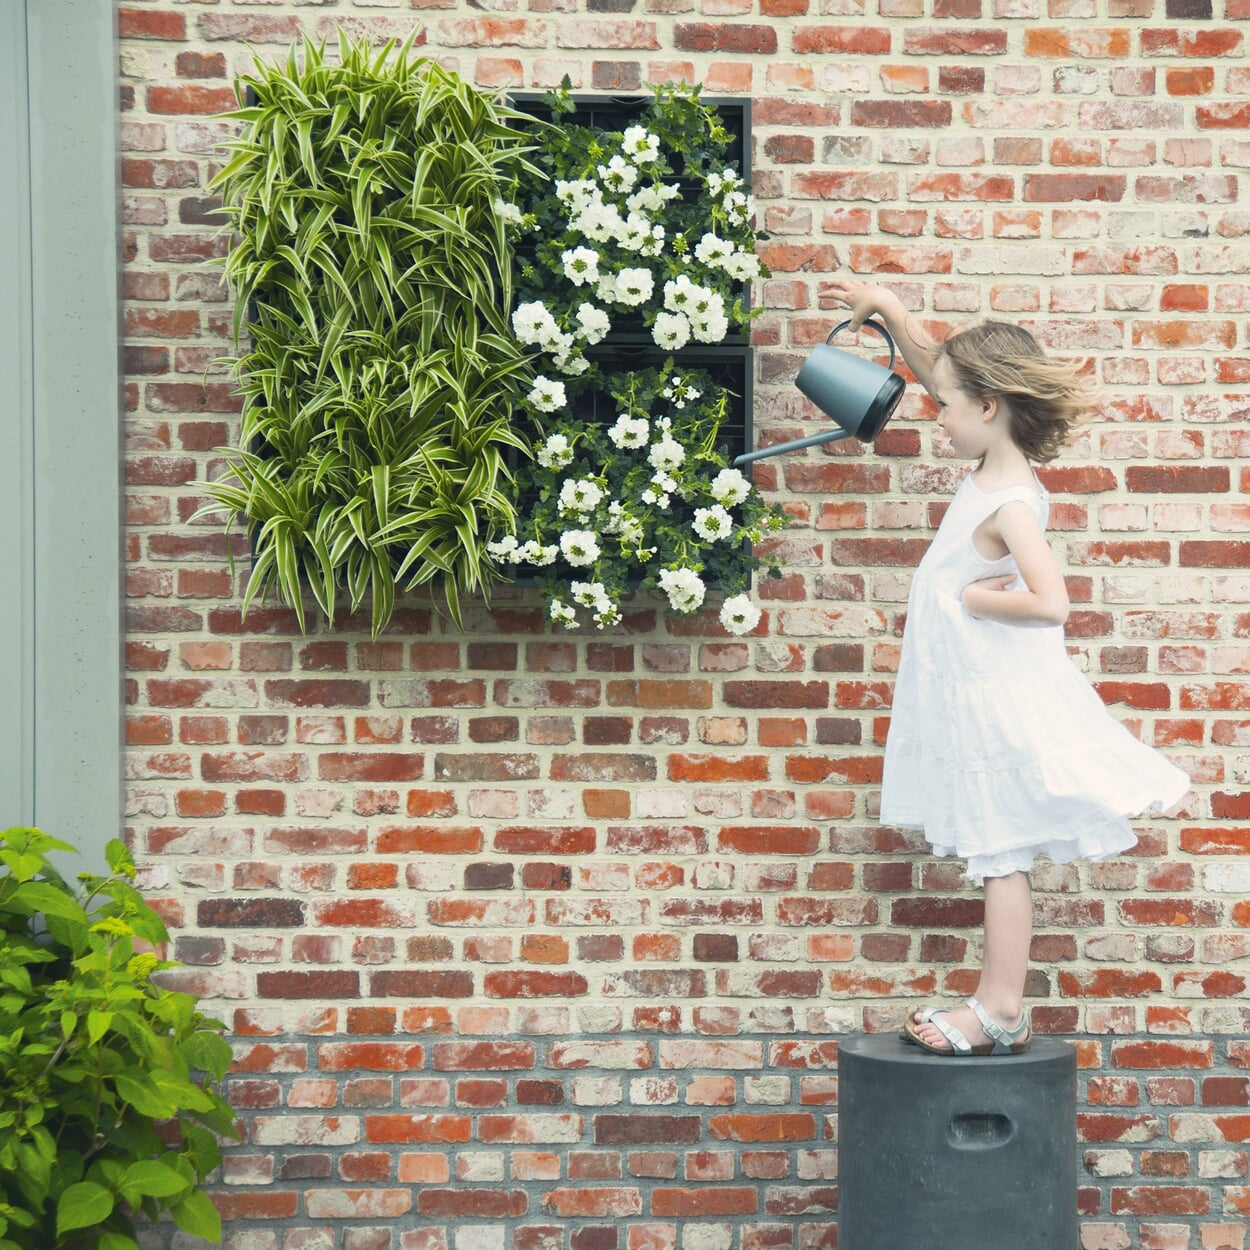 Pflanzelement zur Wandbefestigung